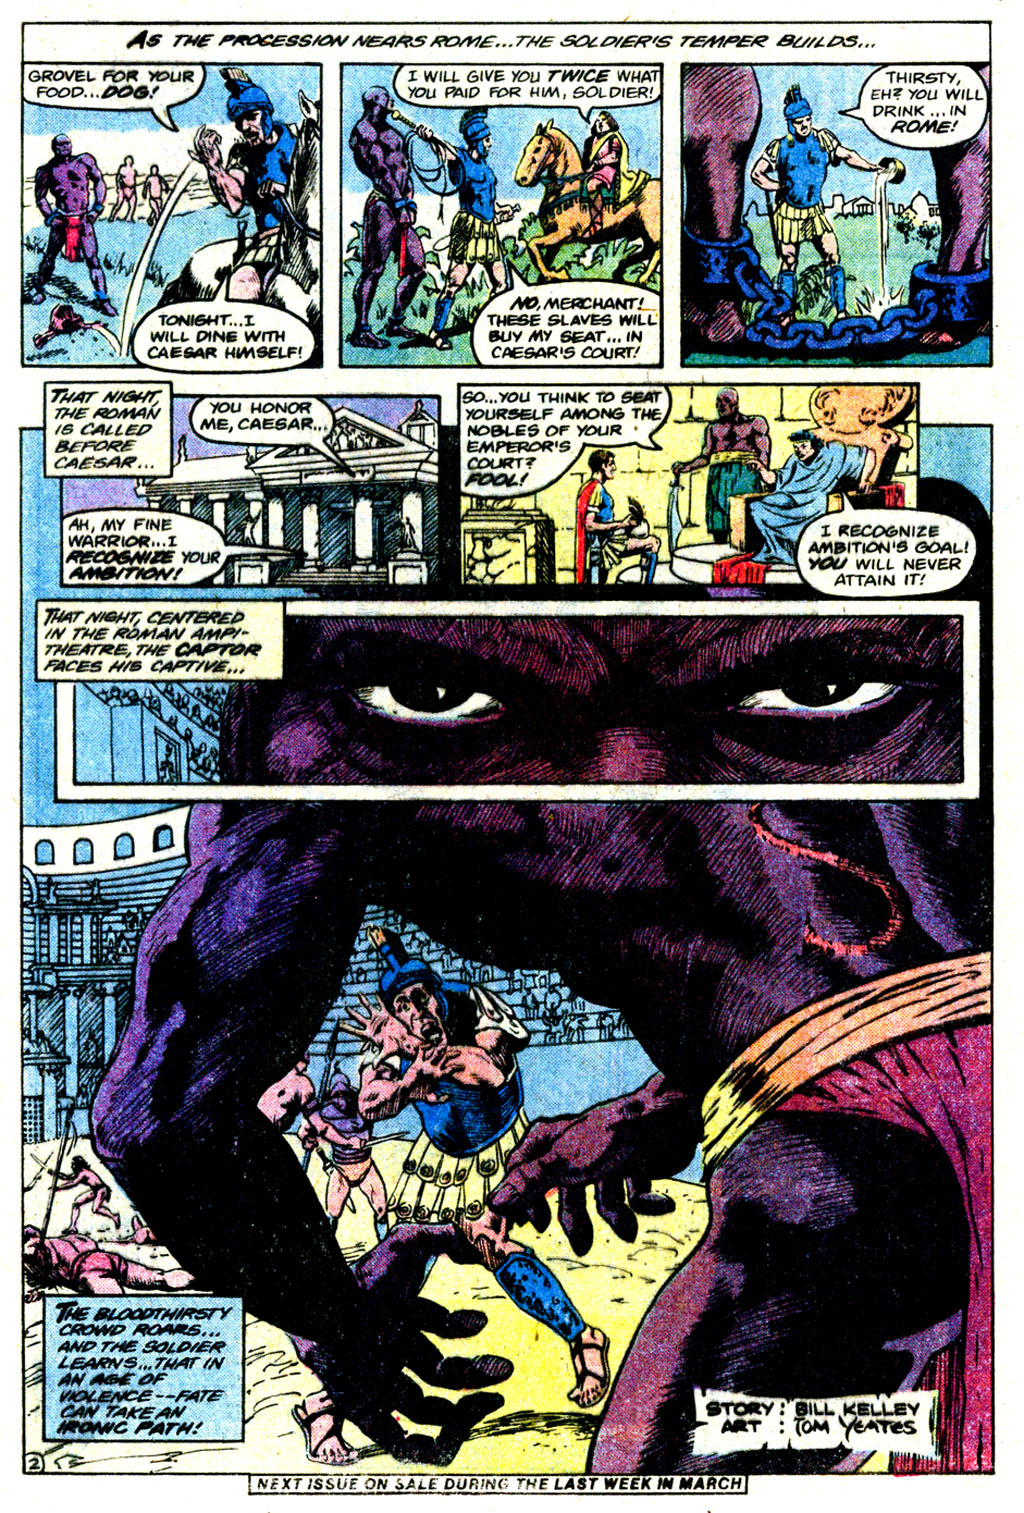 Read online Sgt. Rock comic -  Issue #340 - 20